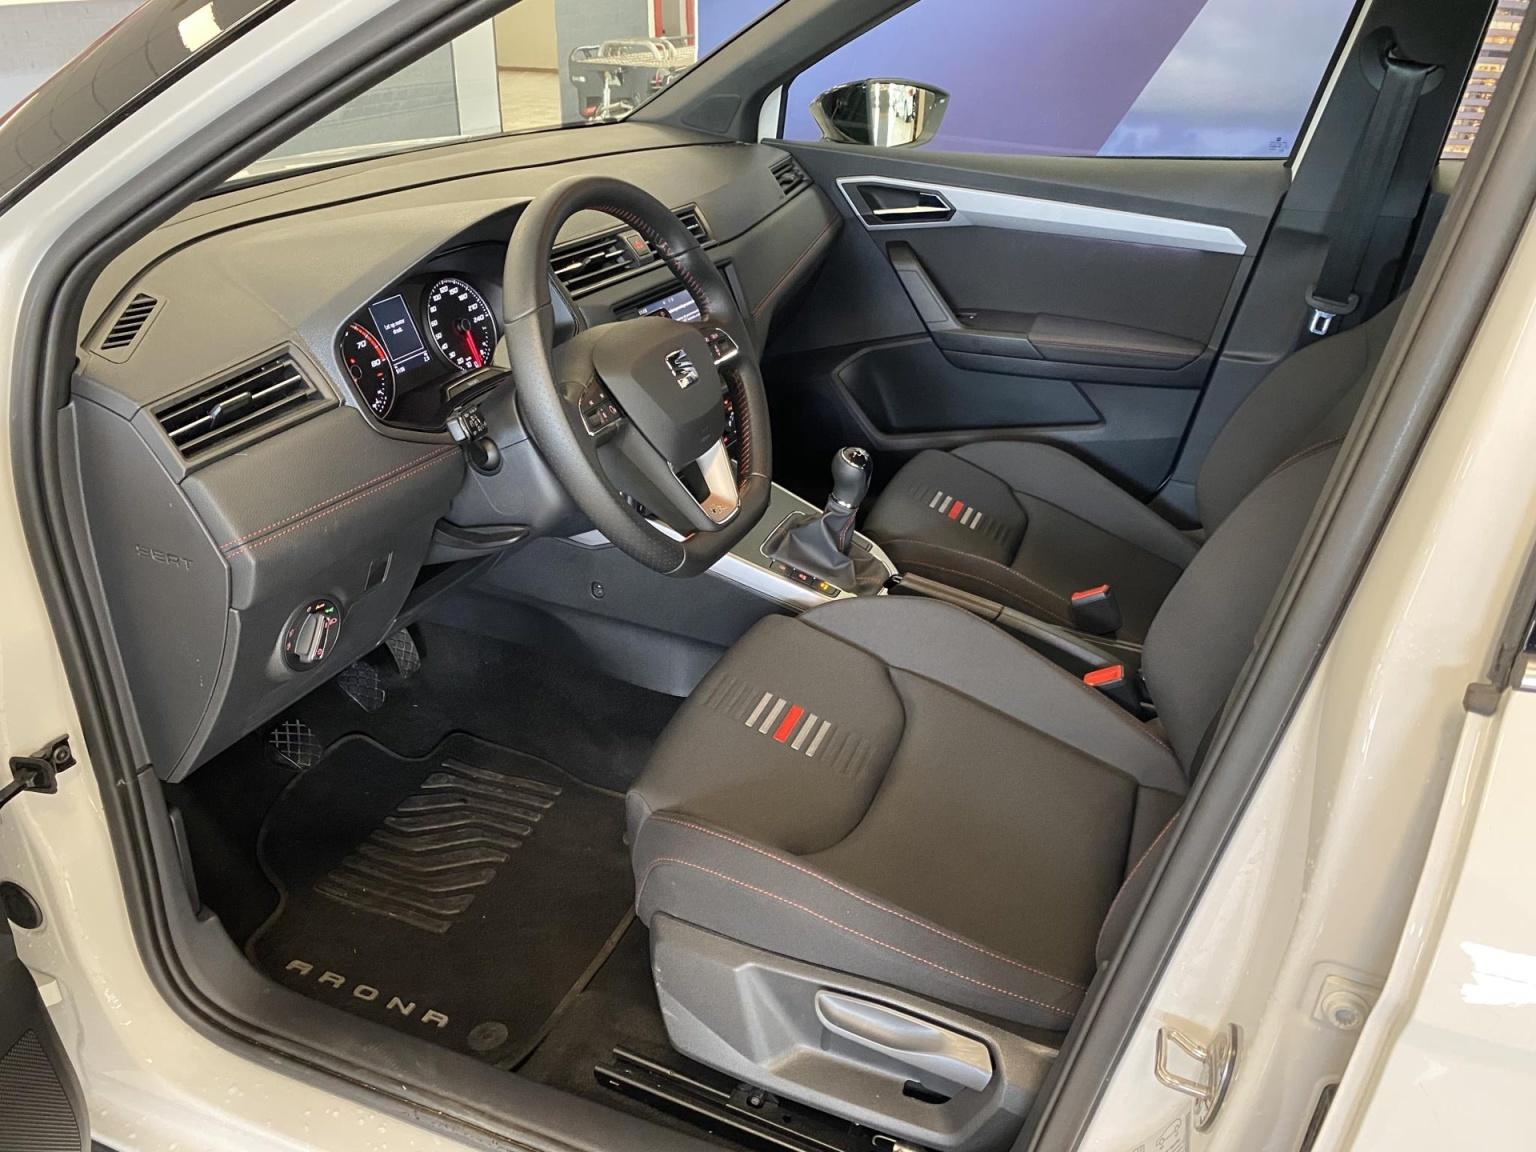 SEAT-Arona-10